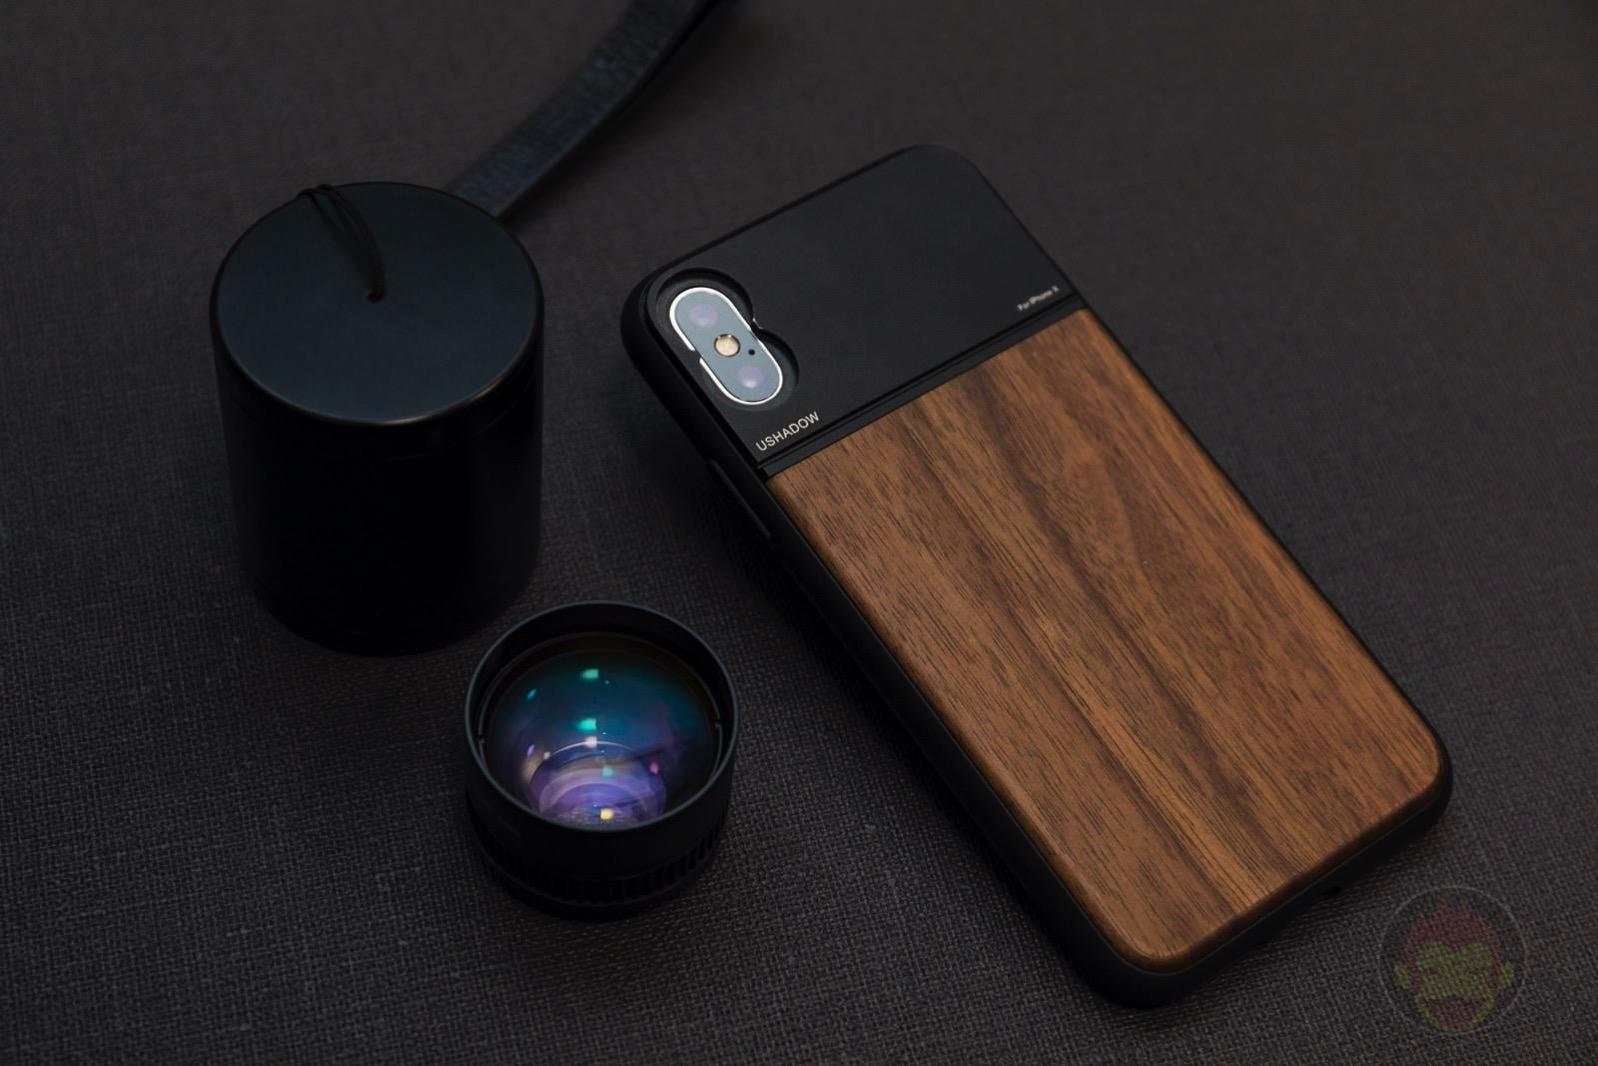 USHADOW-X1-Lens-System-Review-03.jpg